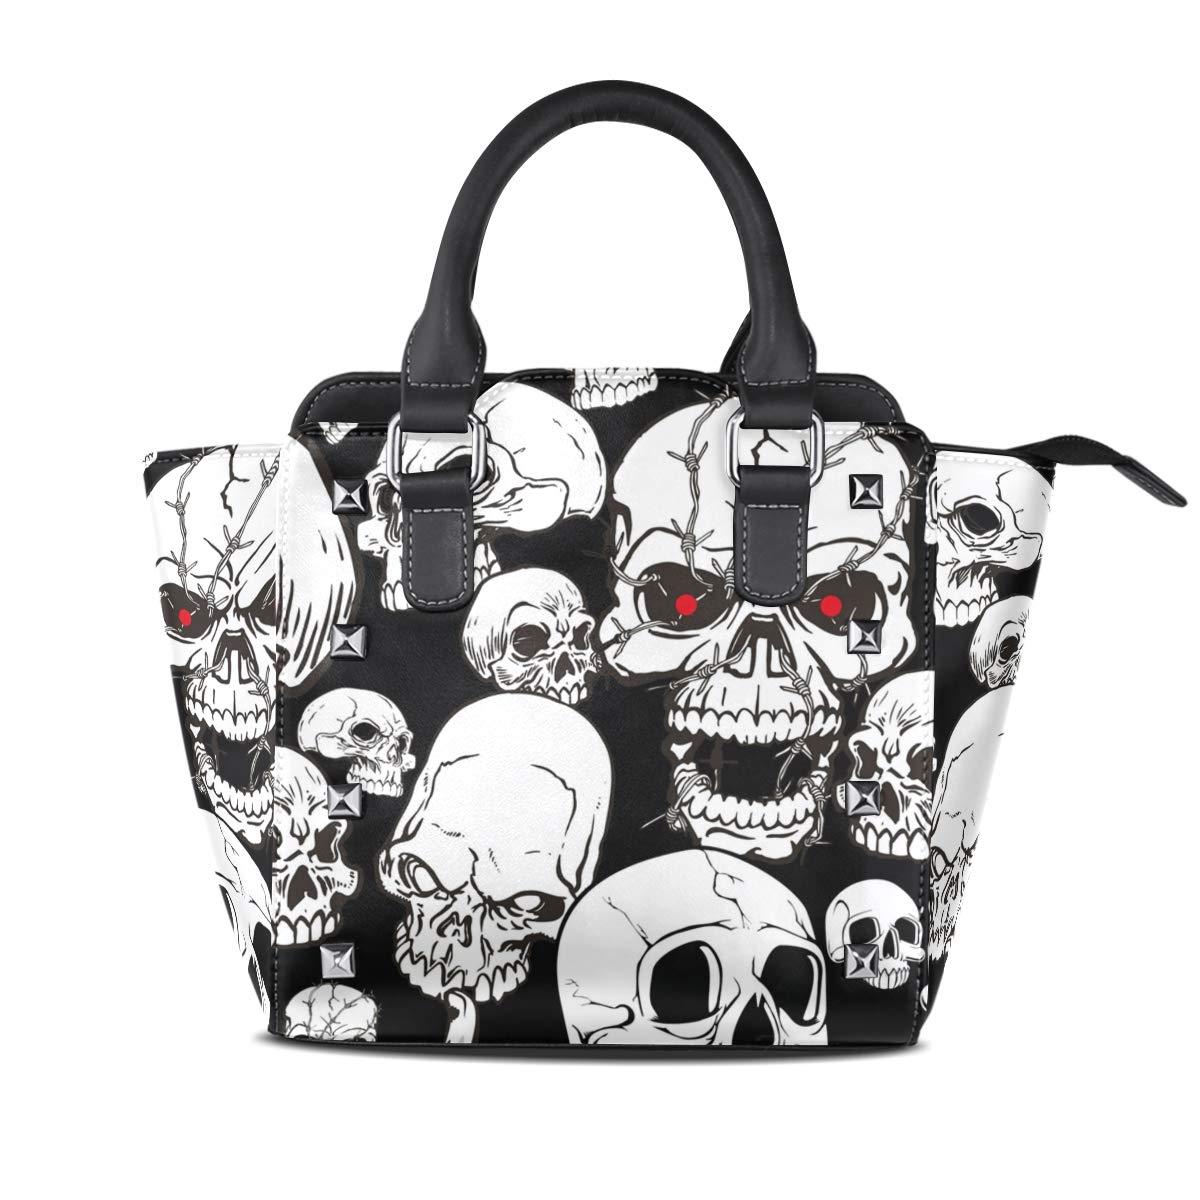 Design3 Handbag Skull Yellow Genuine Leather Tote Rivet Bag Shoulder Strap Top Handle Women